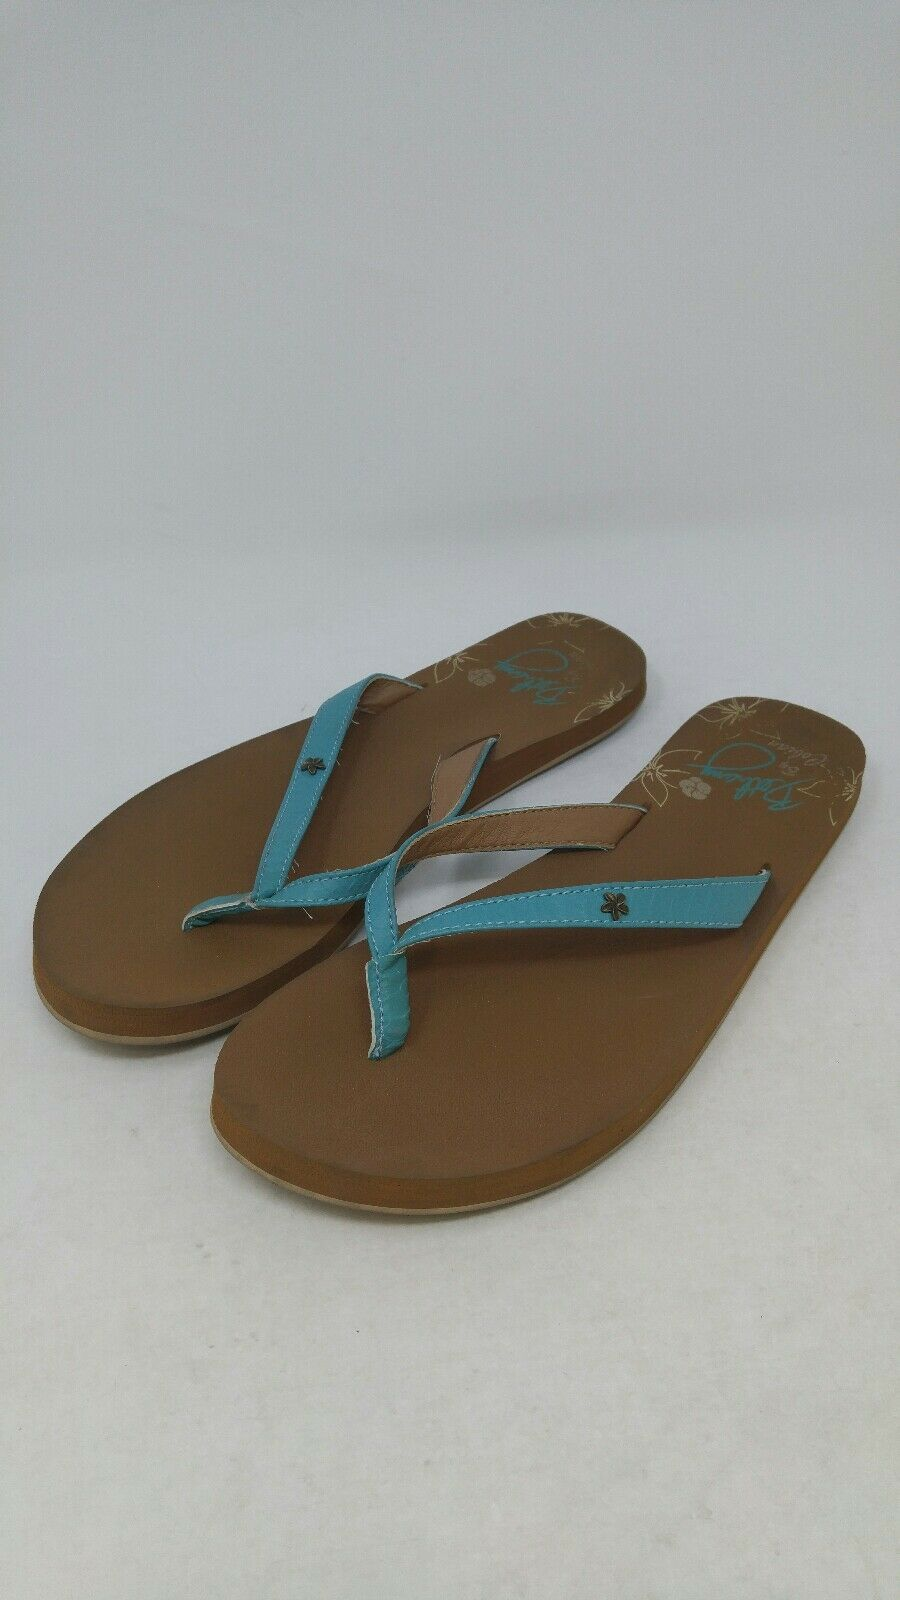 Bethany By Cobian Women's Tan bluee size 9